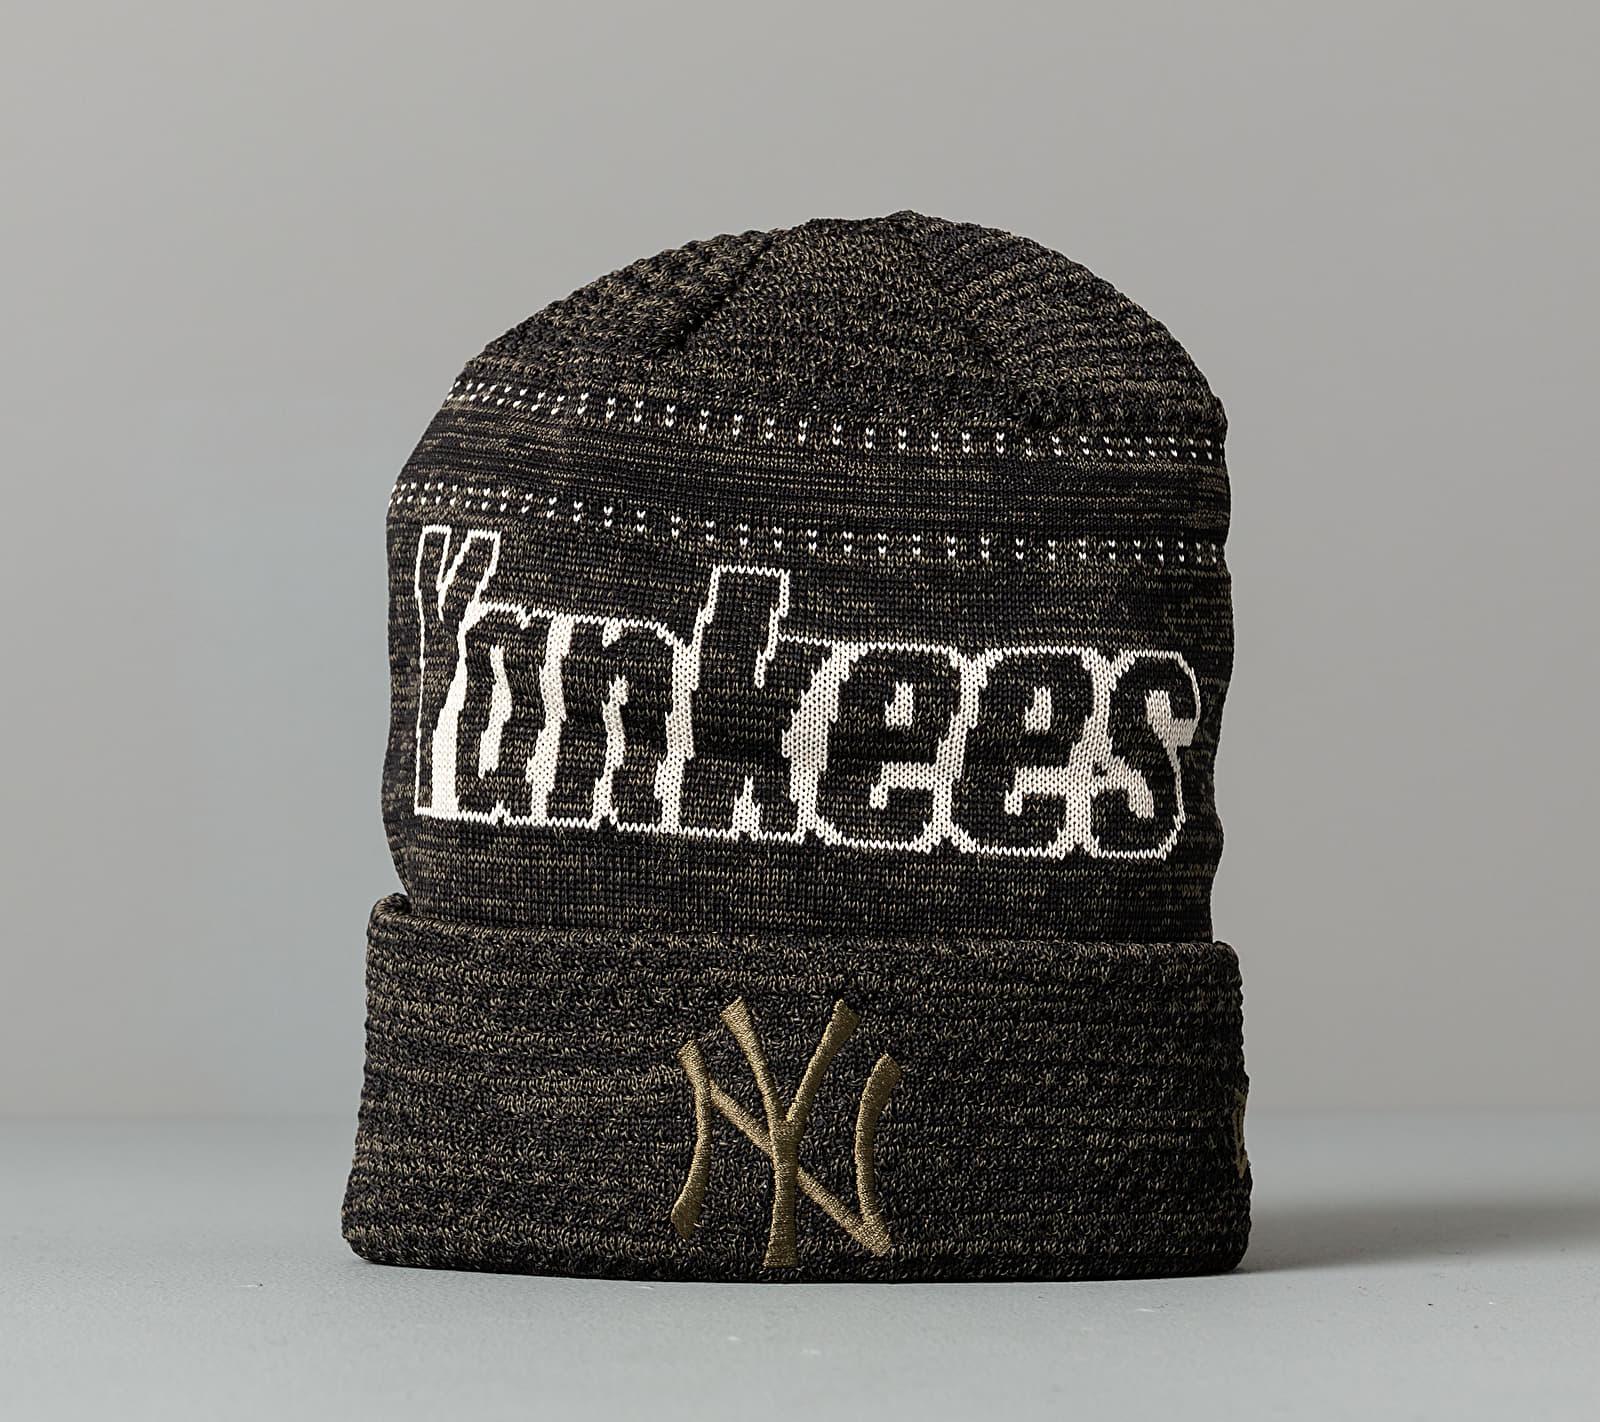 New Era MLB Engineered Fit Cuff New York Yankees Beanie Olive Univerzální velikost